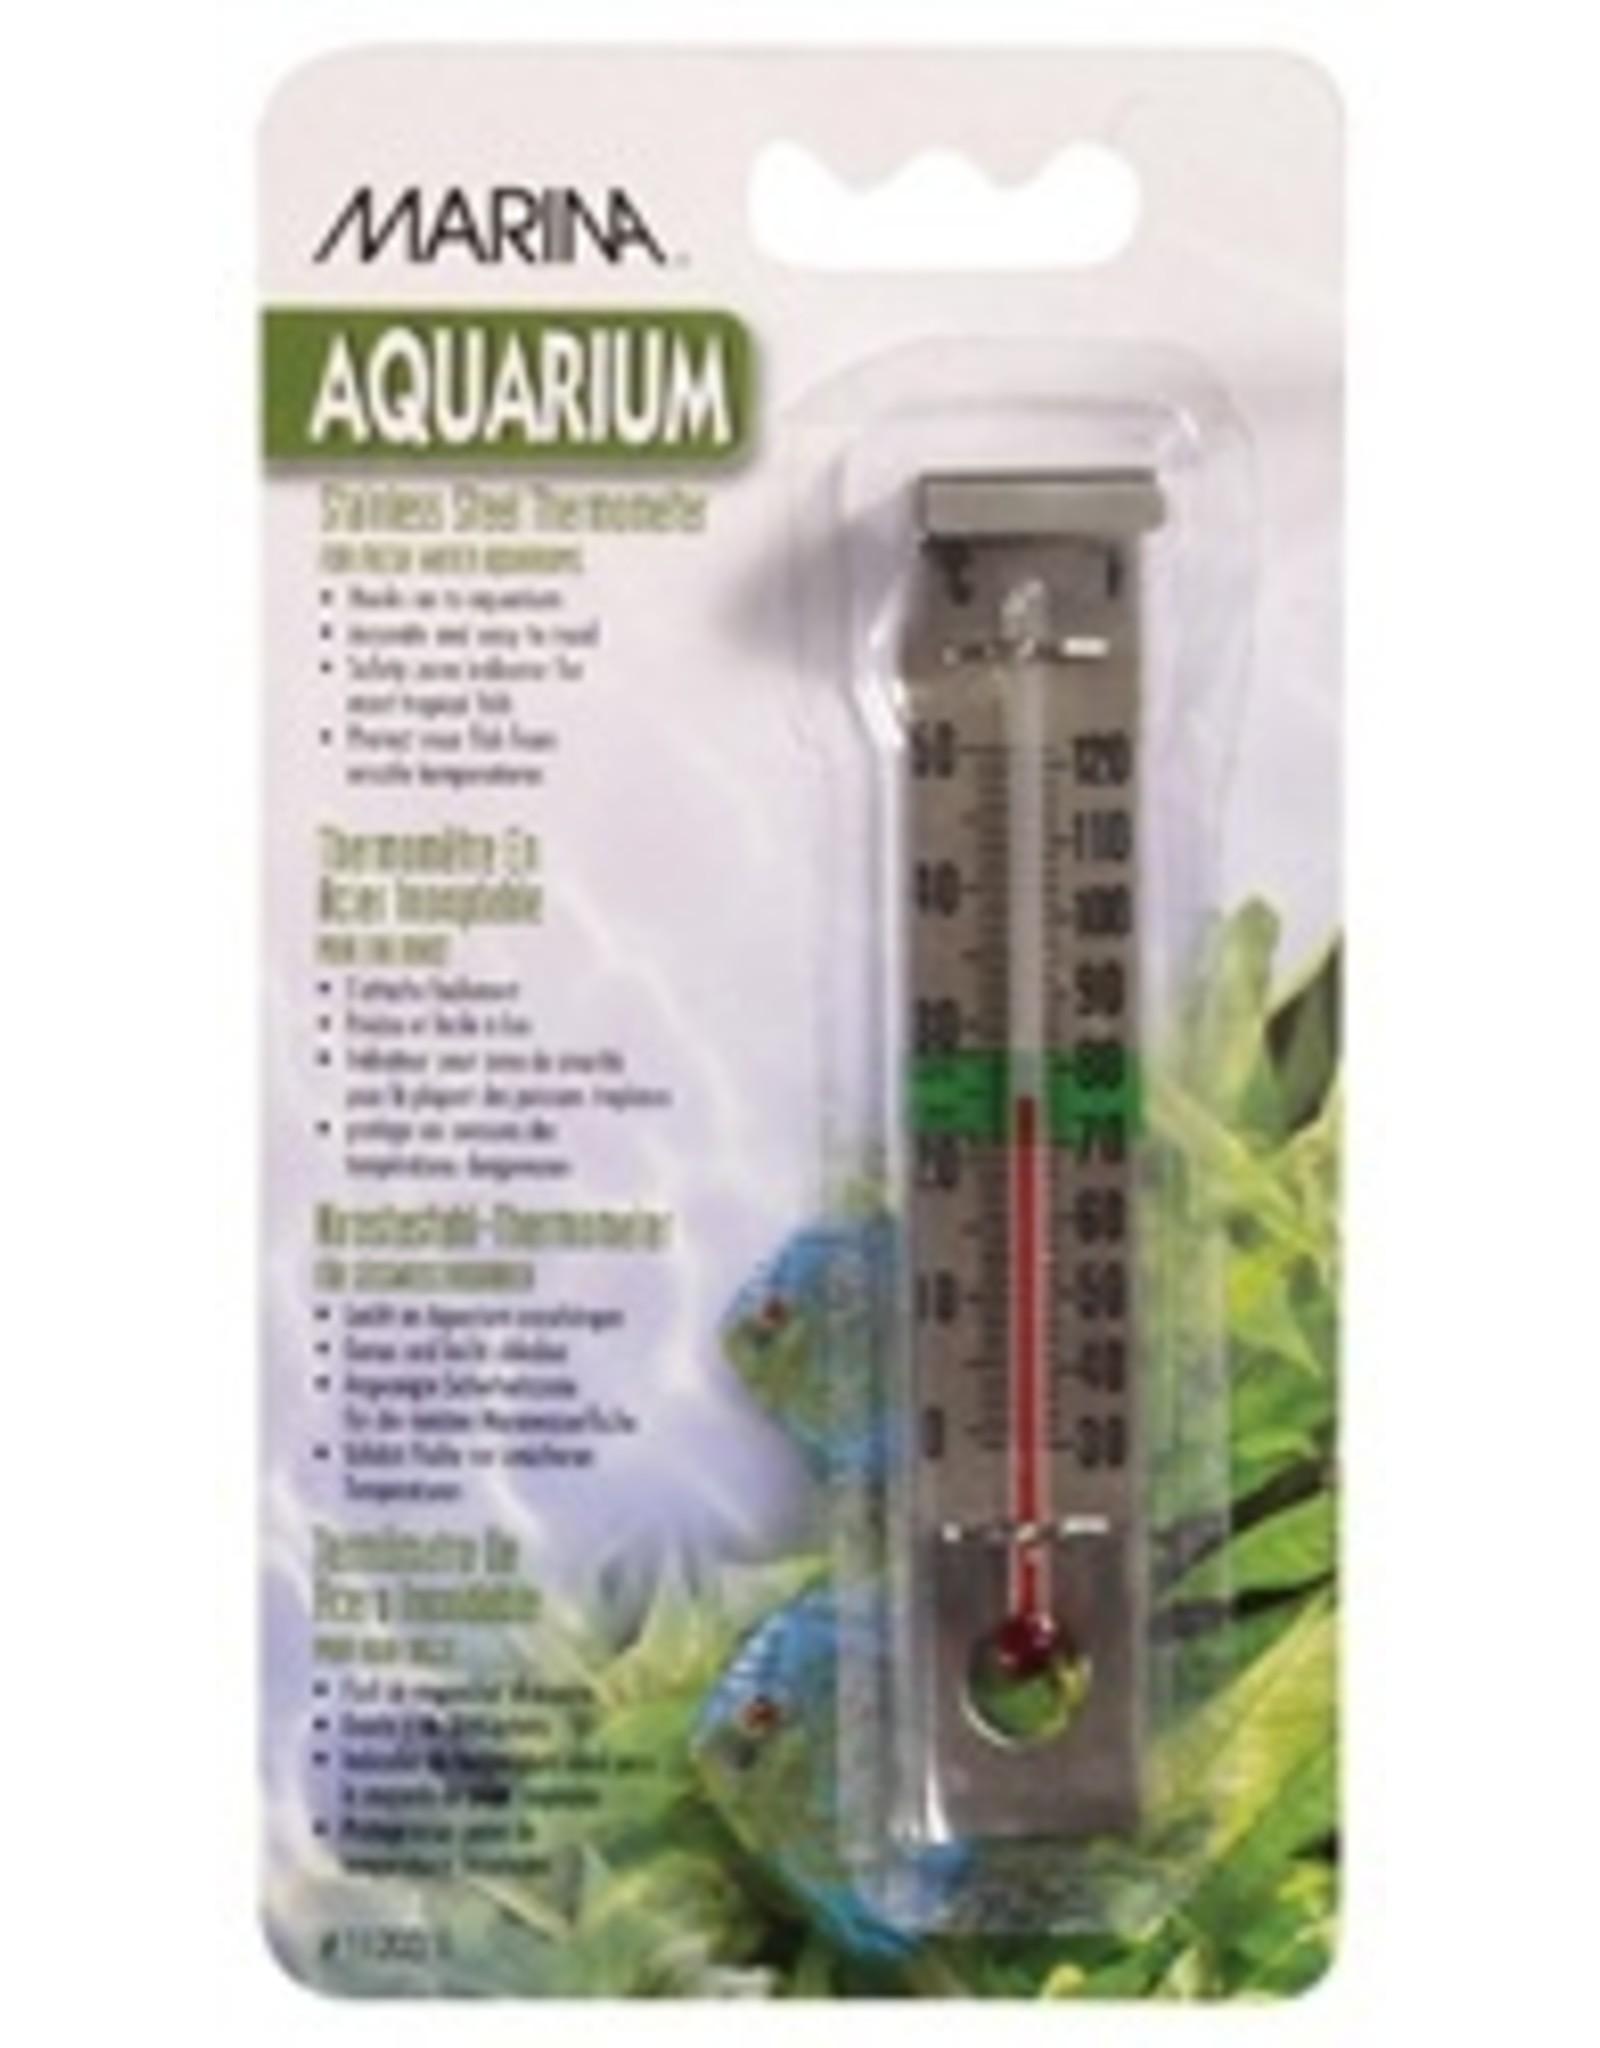 MA - Marina Marina Stainless Steel Thermometer